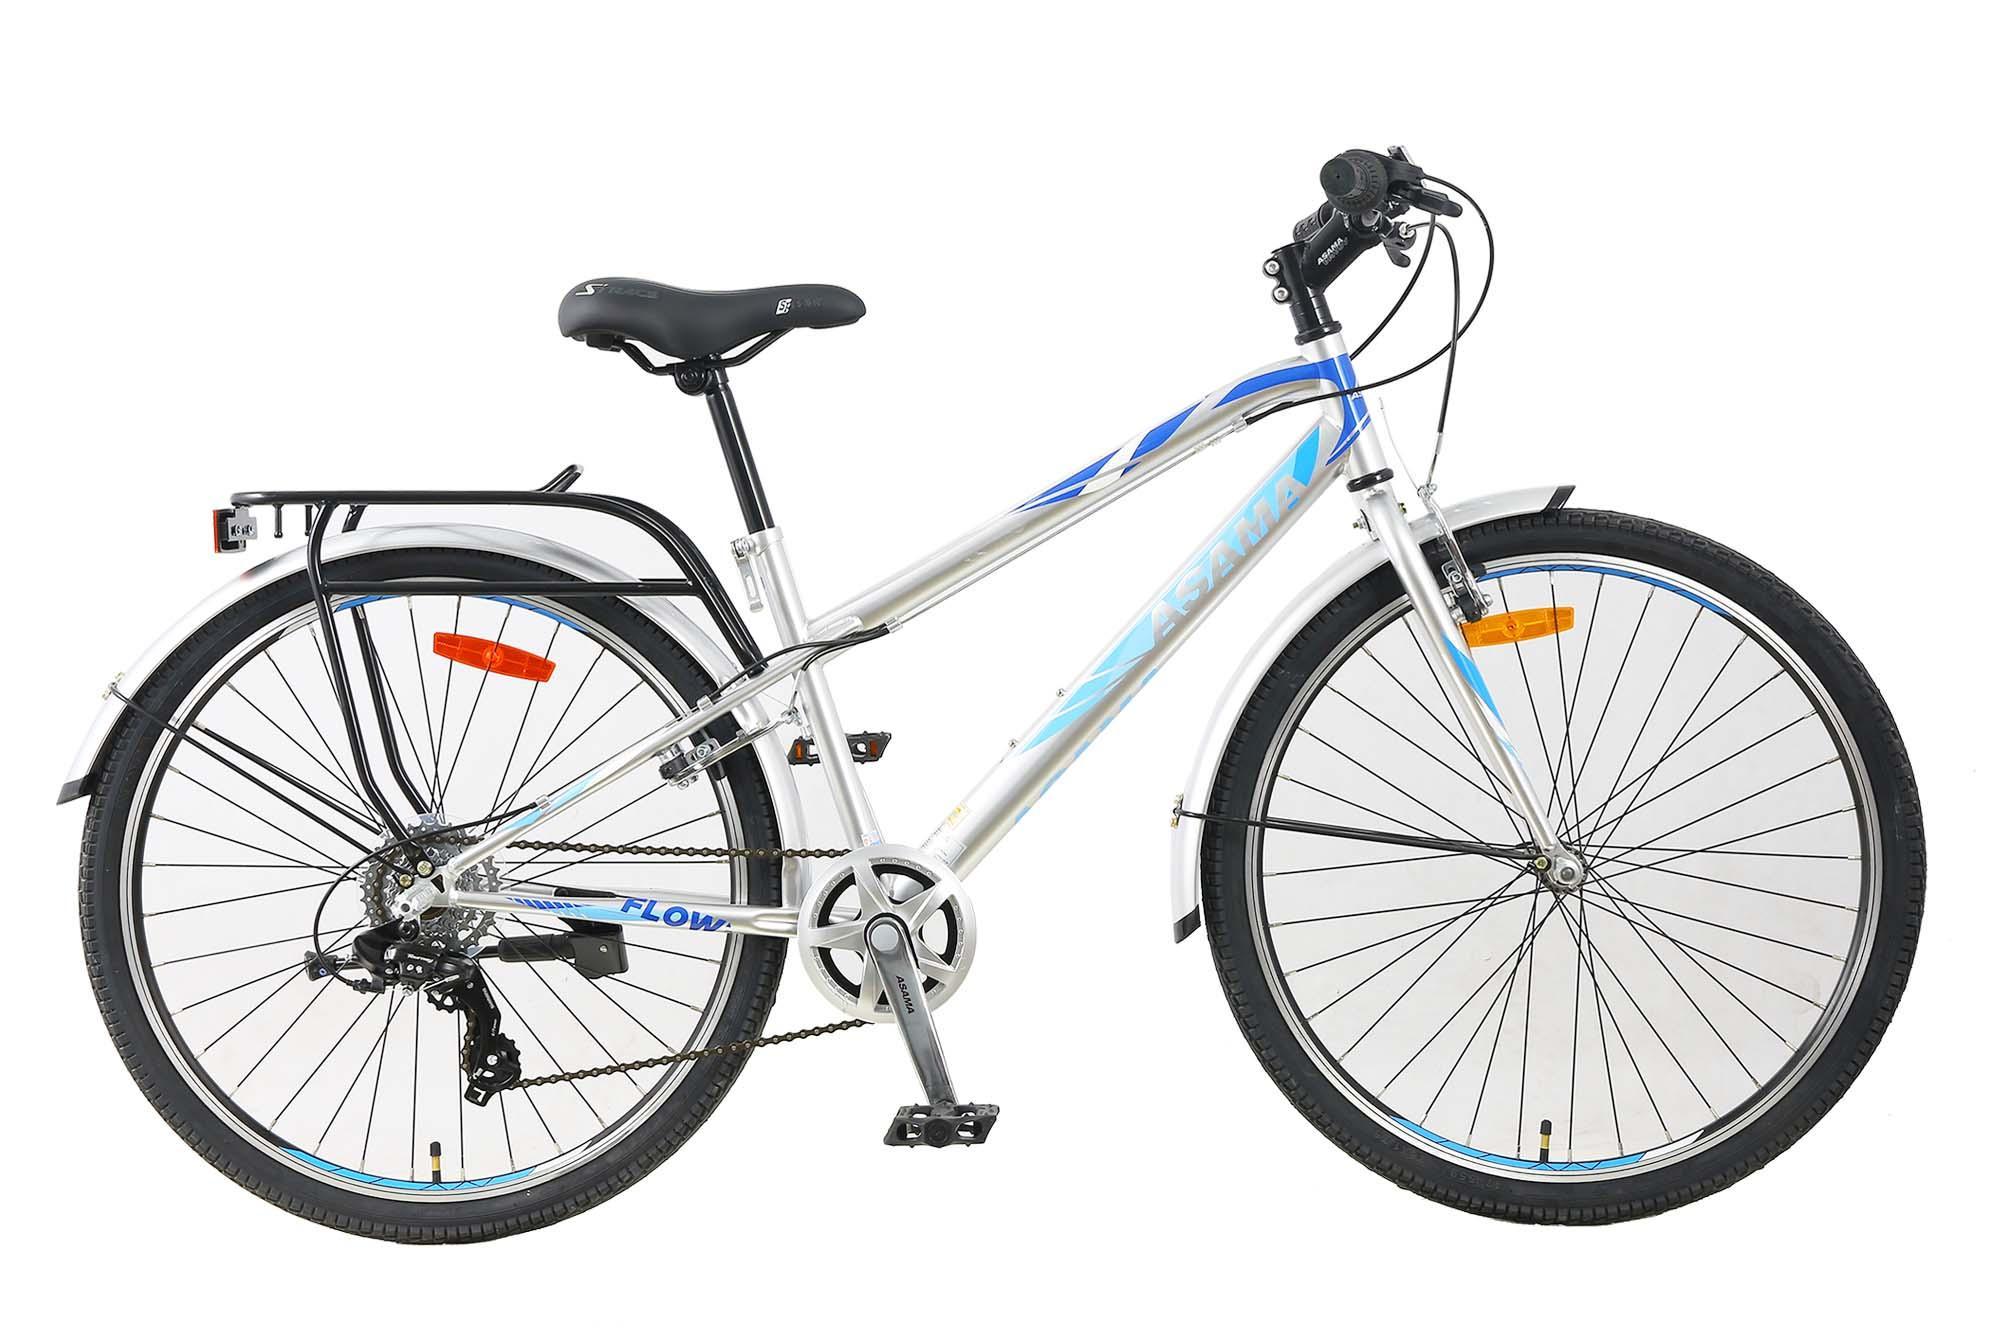 Mua Xe đạp thể thao Asama TRK - FL 2601(Bạc)